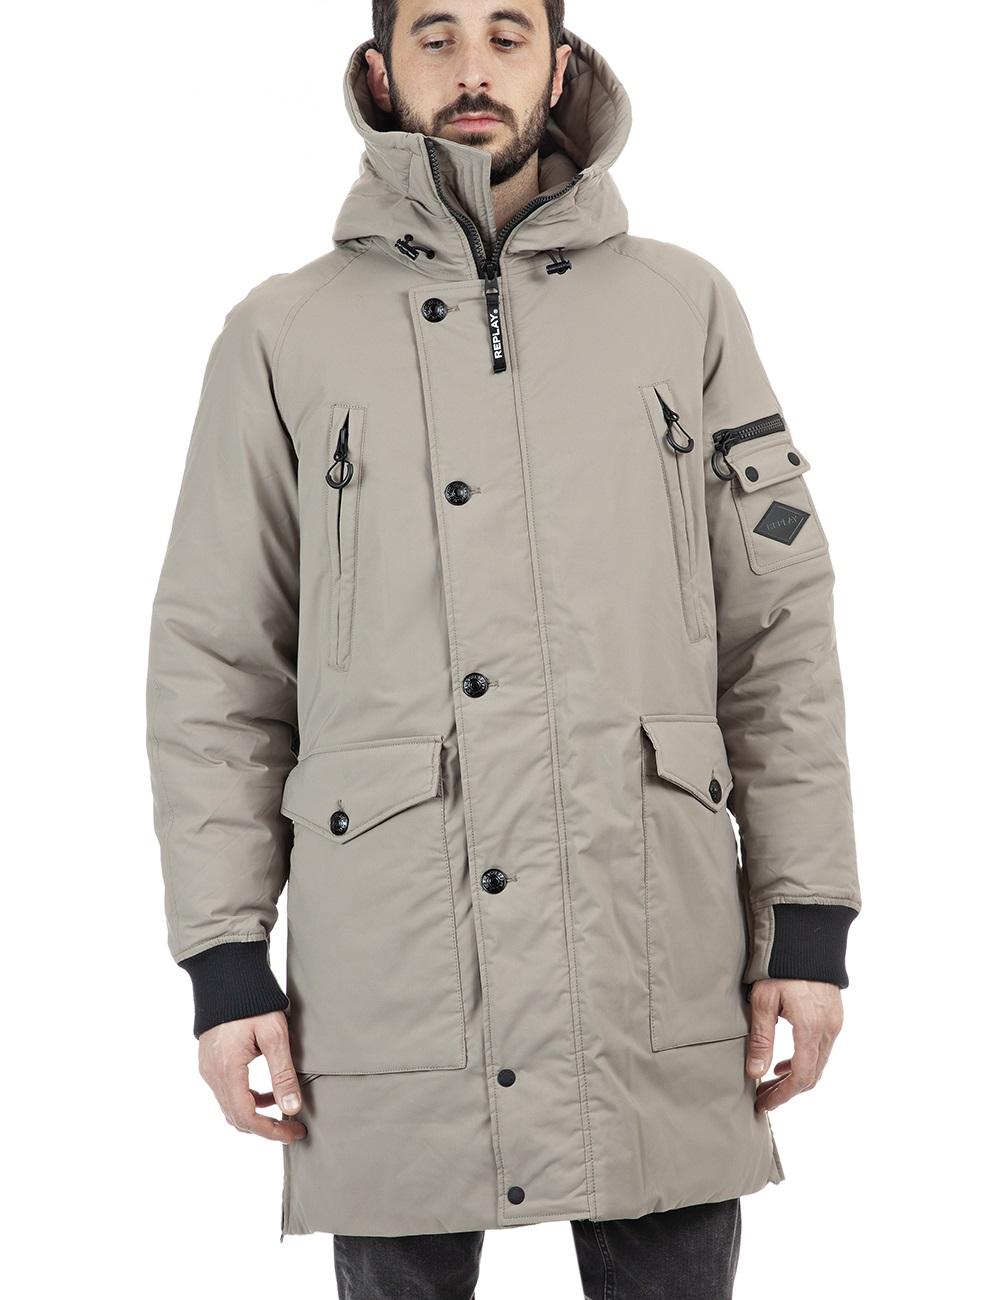 Replay zimske jakne za njega 2020.